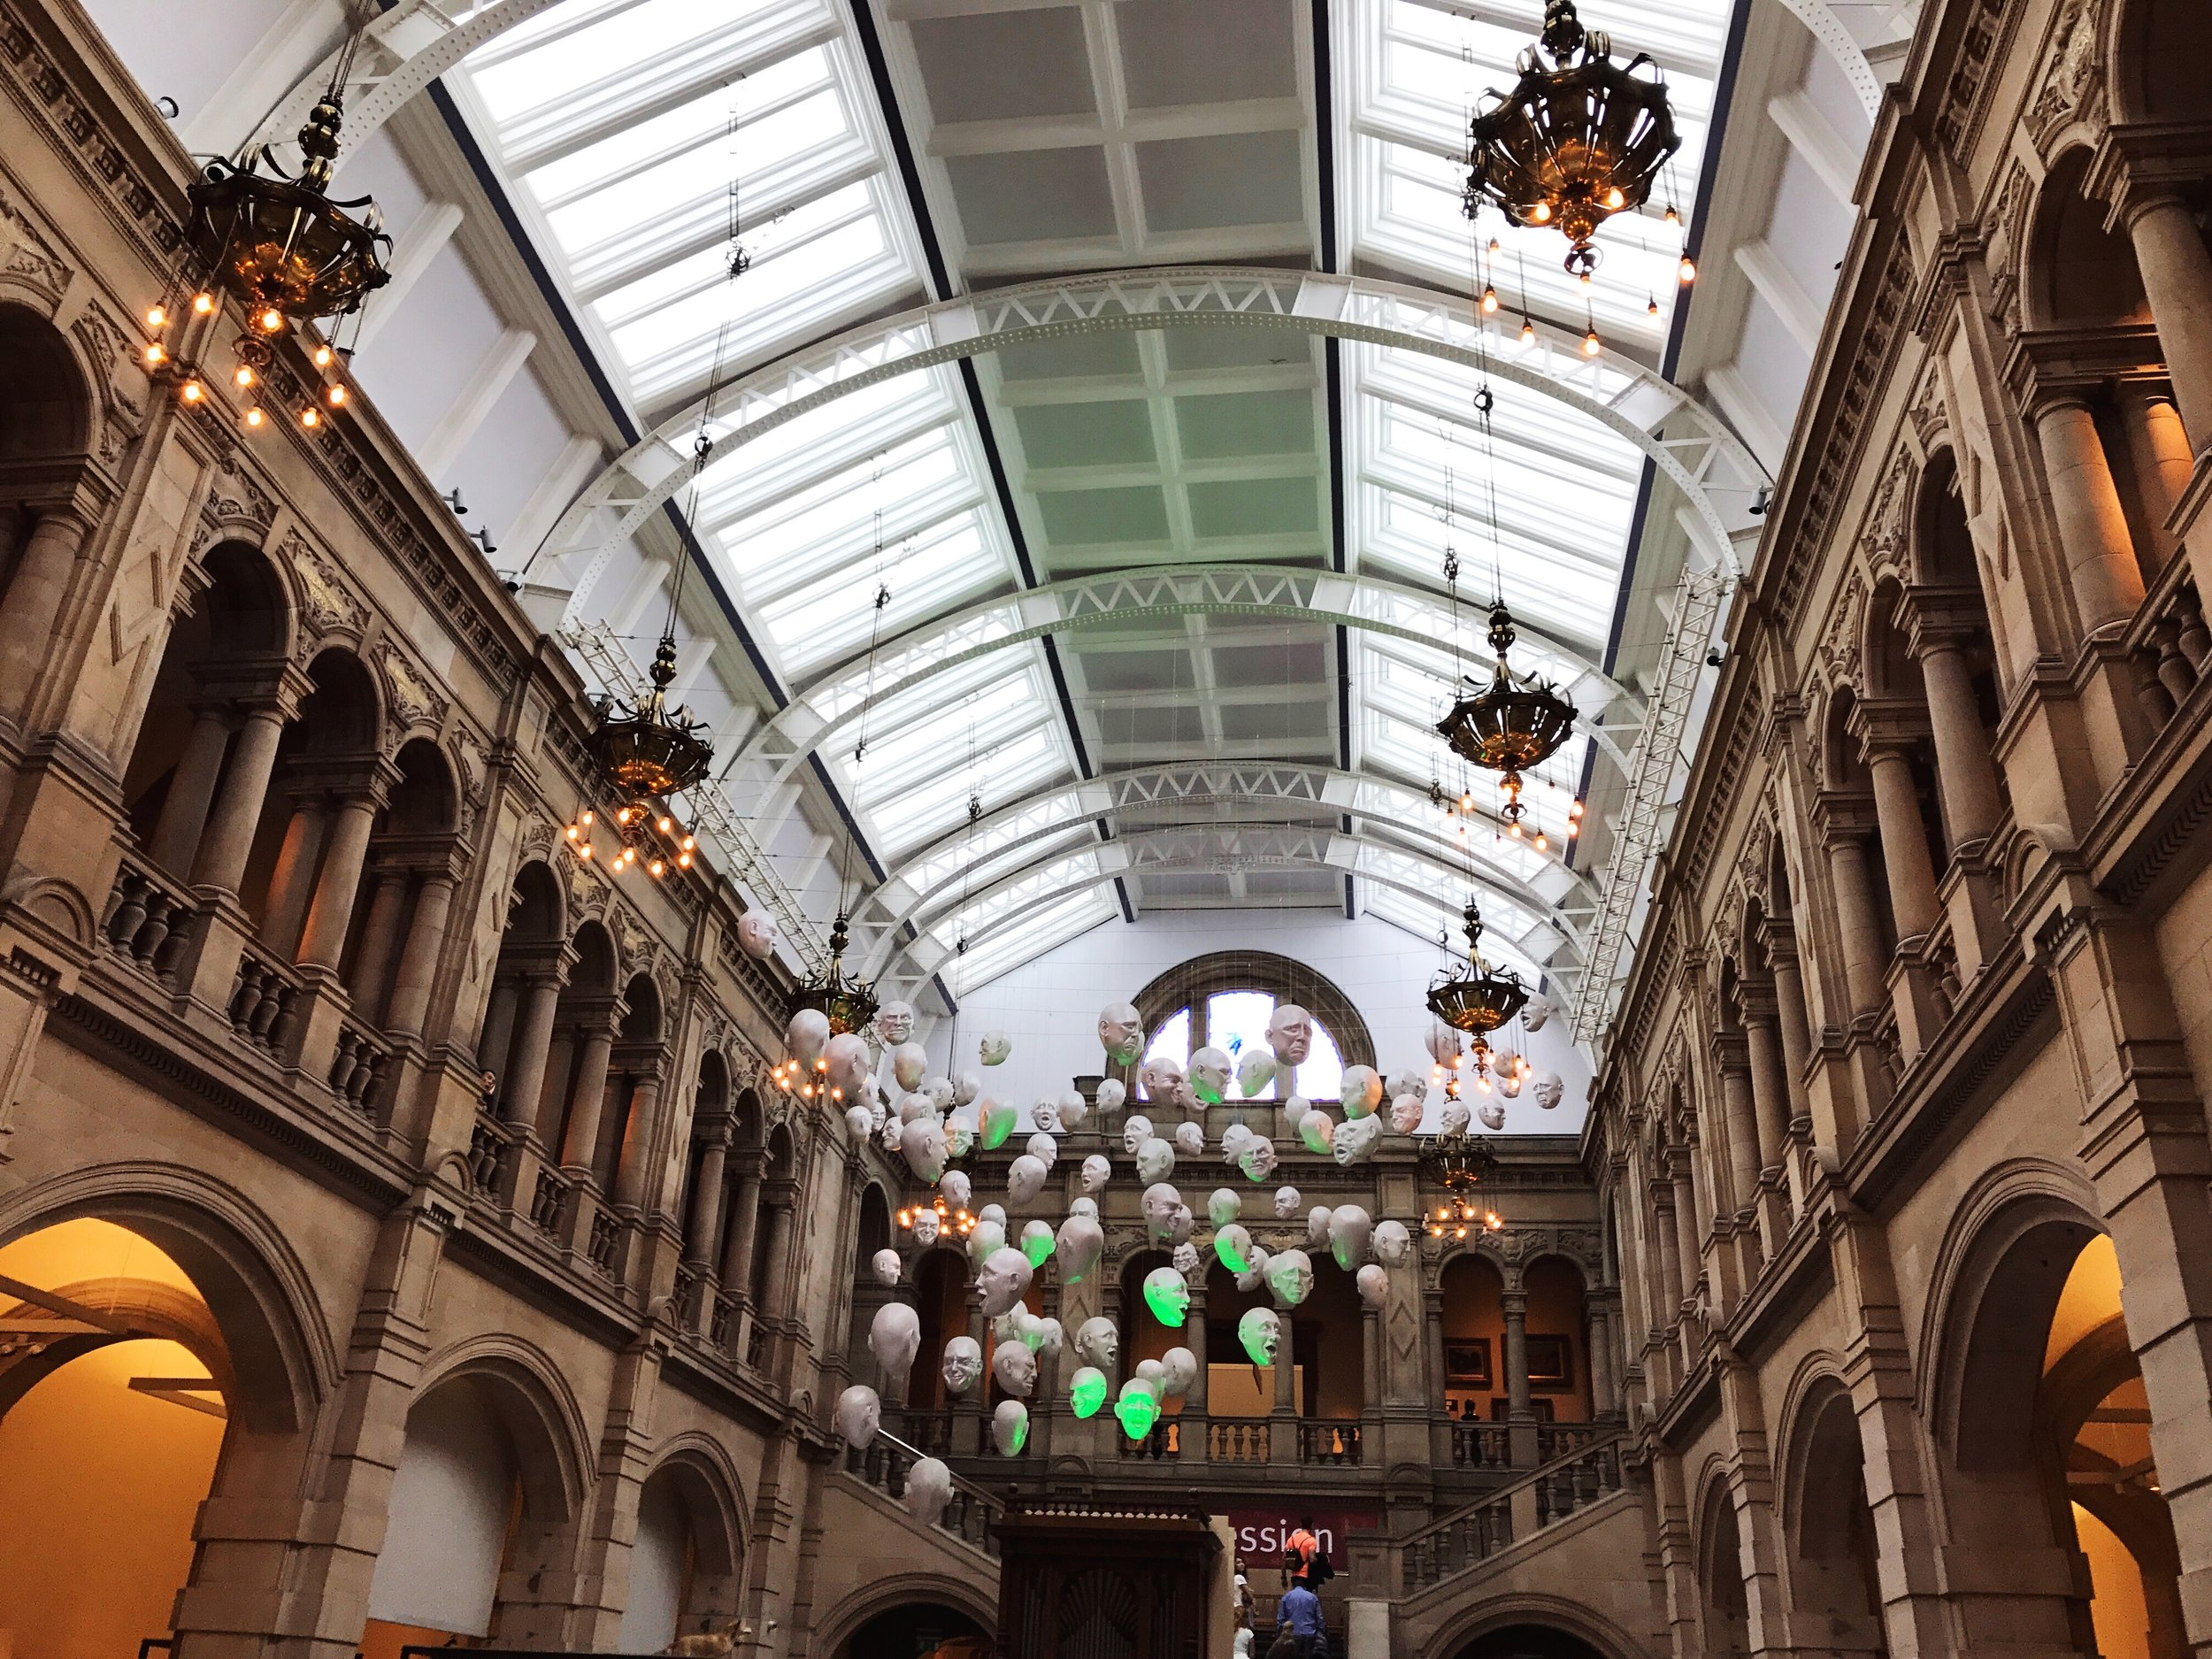 Inside Kelvingrove Art Gallery and Museum, Glasgow